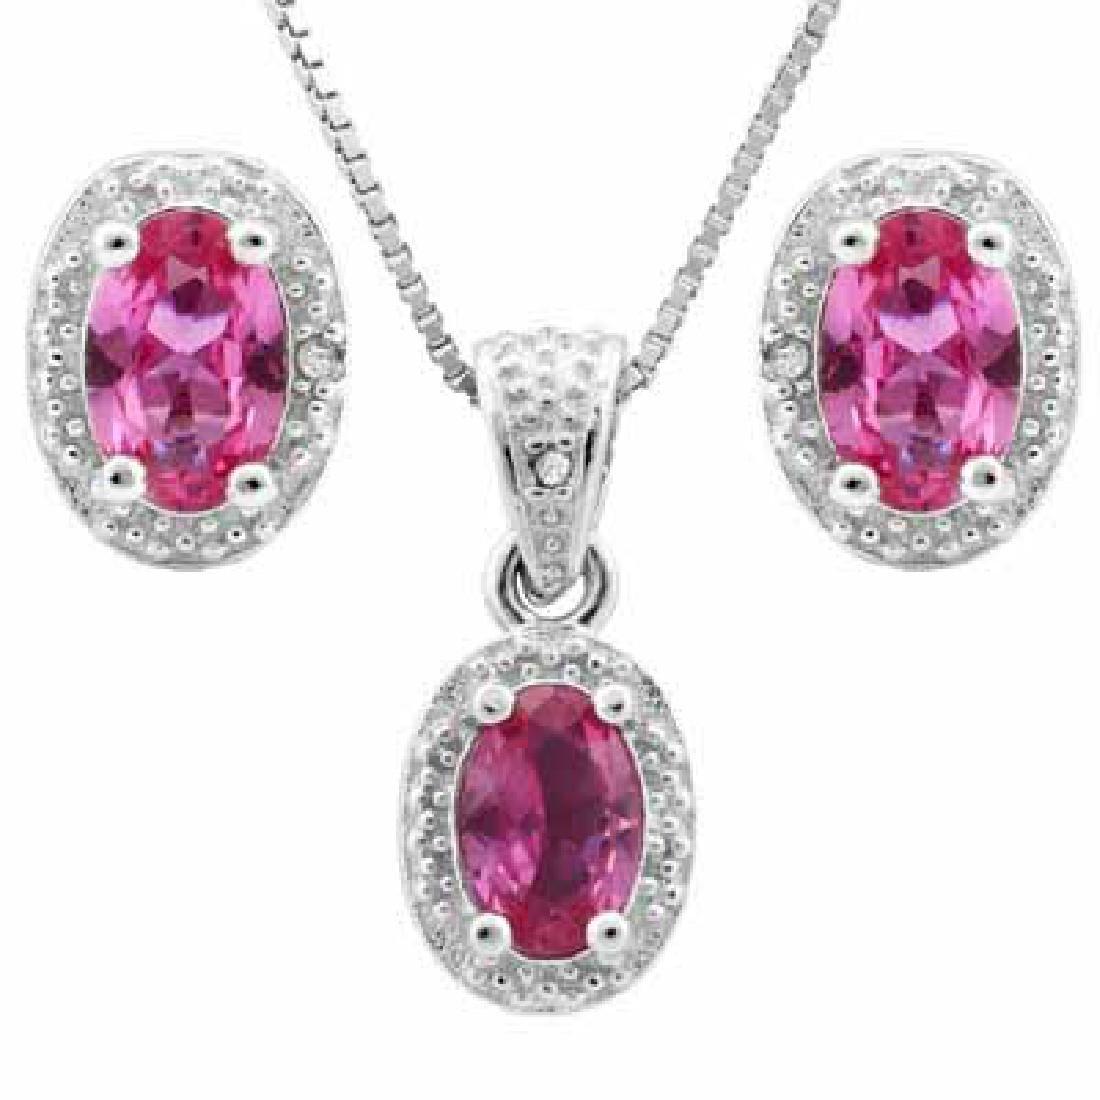 2.00 CT CREATED PINK SAPPHIRE & 5PCS GENUINE DIAMOND PL